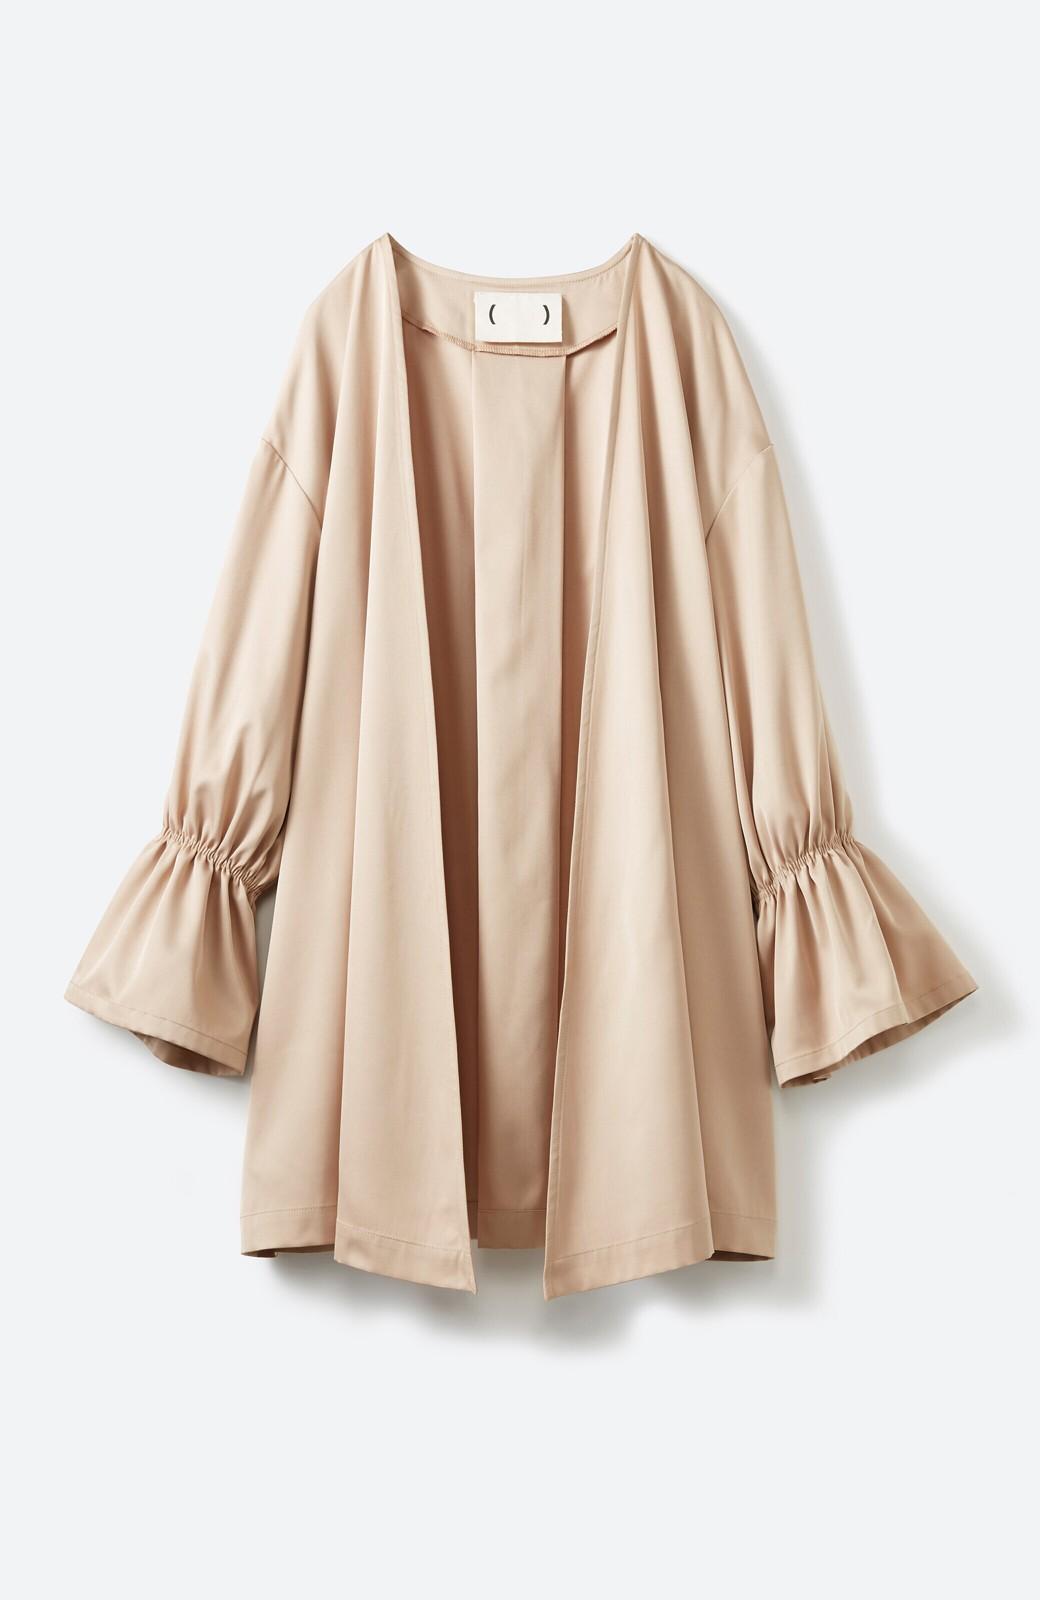 haco! ただ羽織るだけでオシャレに見える 気軽なフレアースリーブコート <ベージュ>の商品写真2